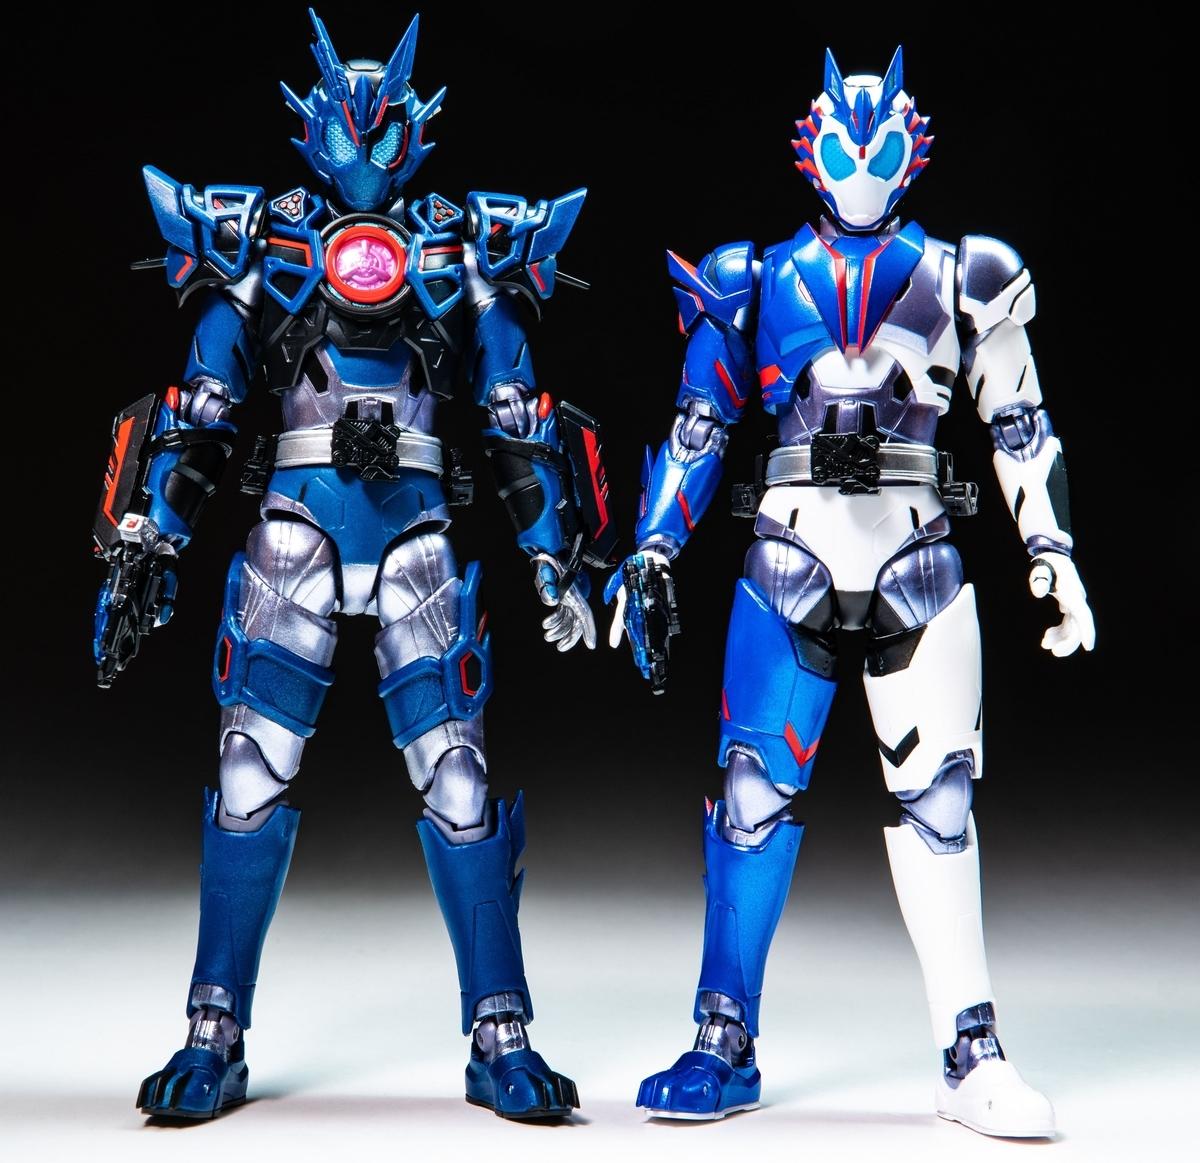 f:id:hiroban-ch:20201220000915j:plain